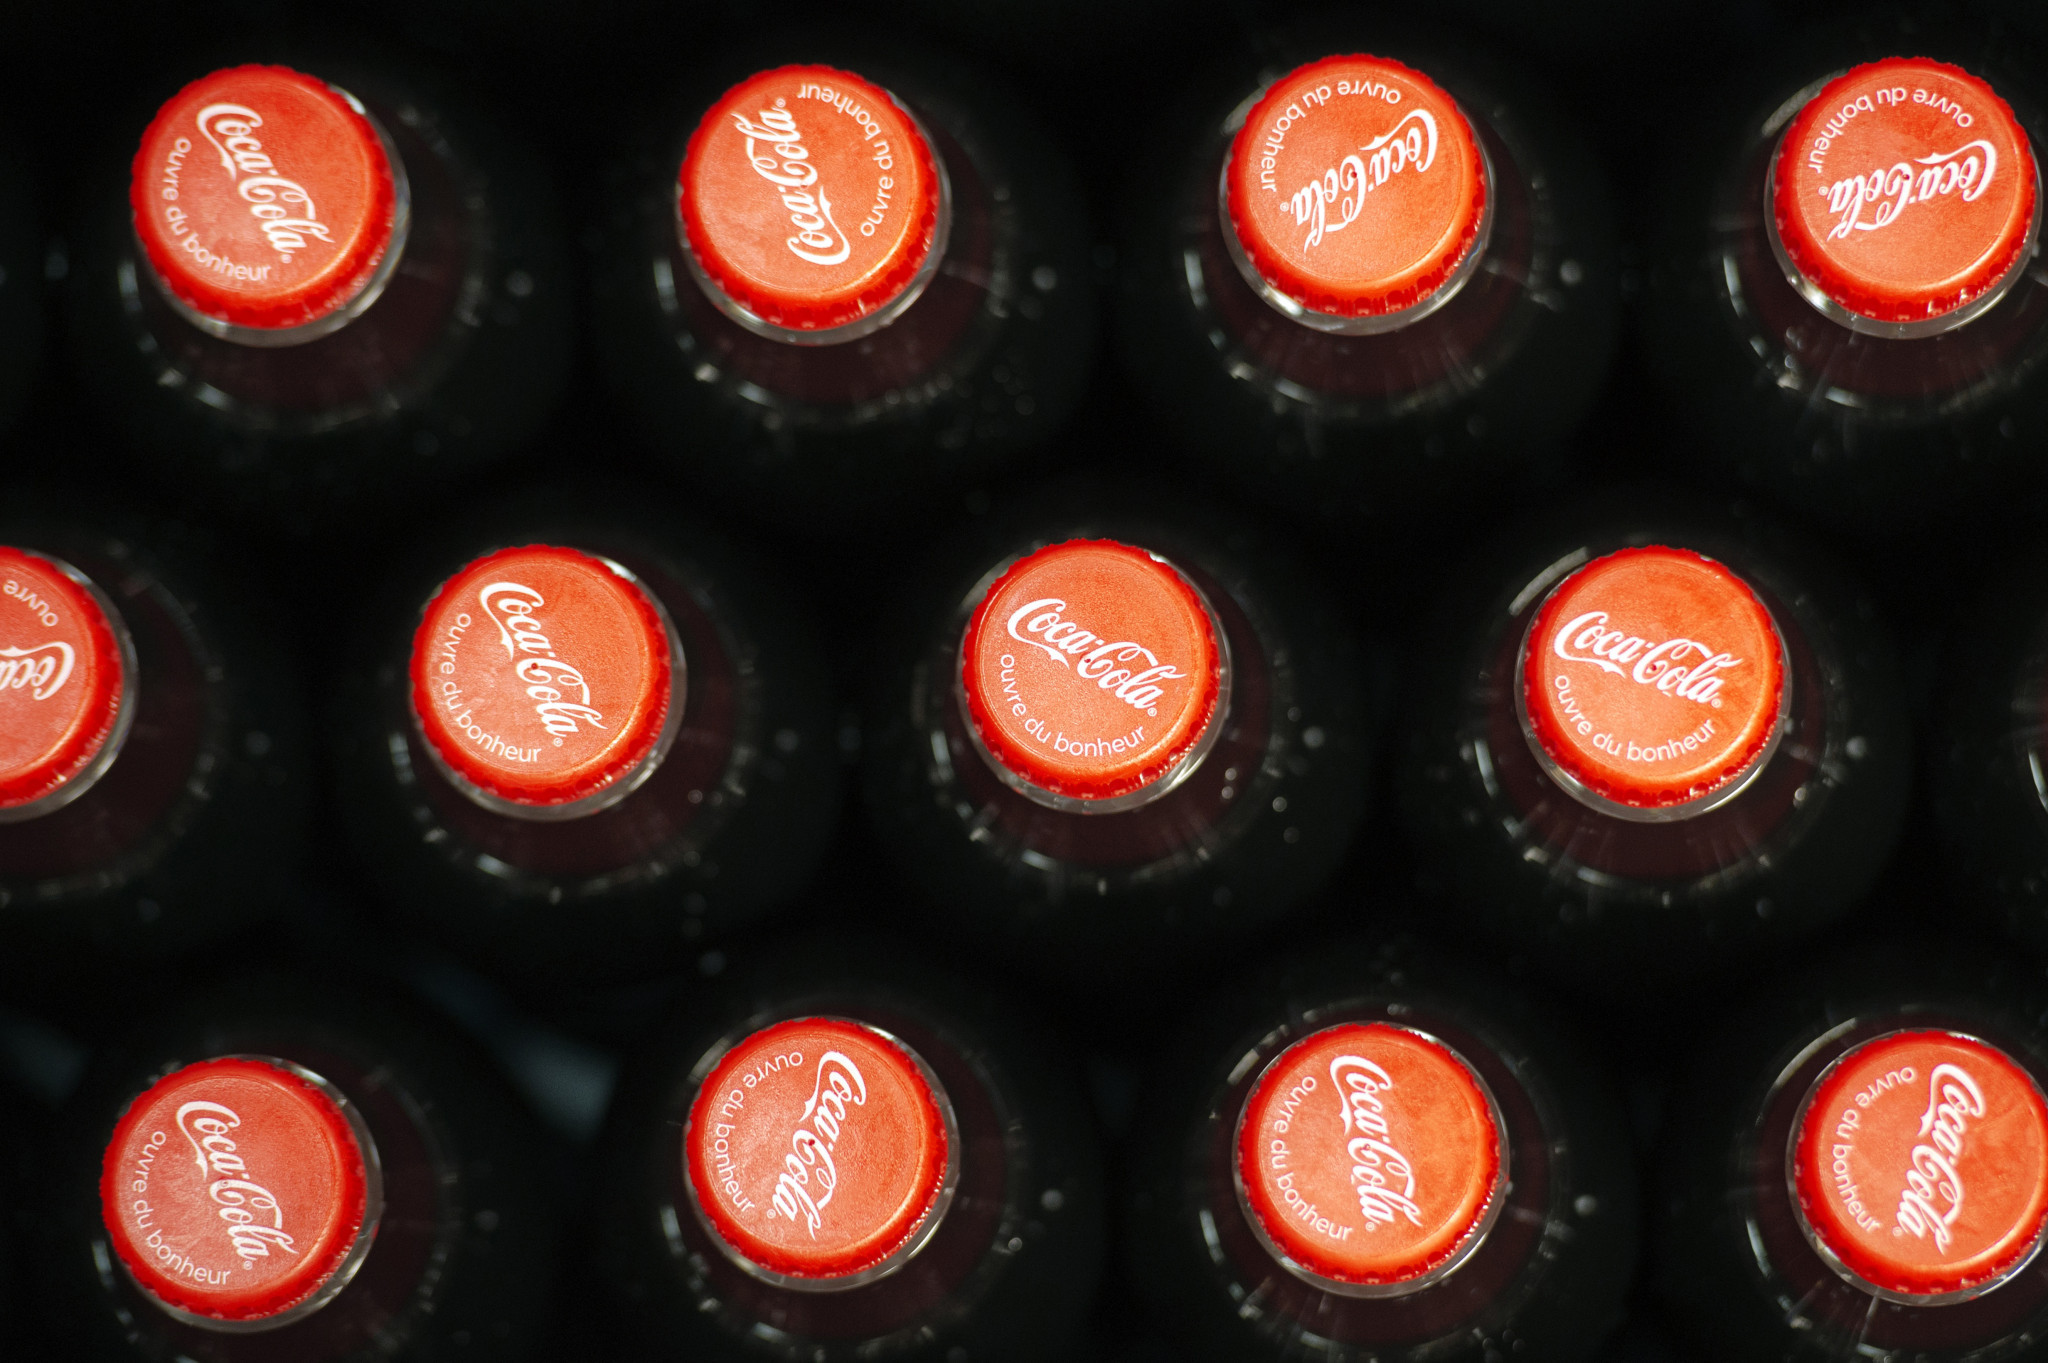 Coca-Cola Bottling Company United named presenting sponsor for 2022 World Games Closing Ceremony